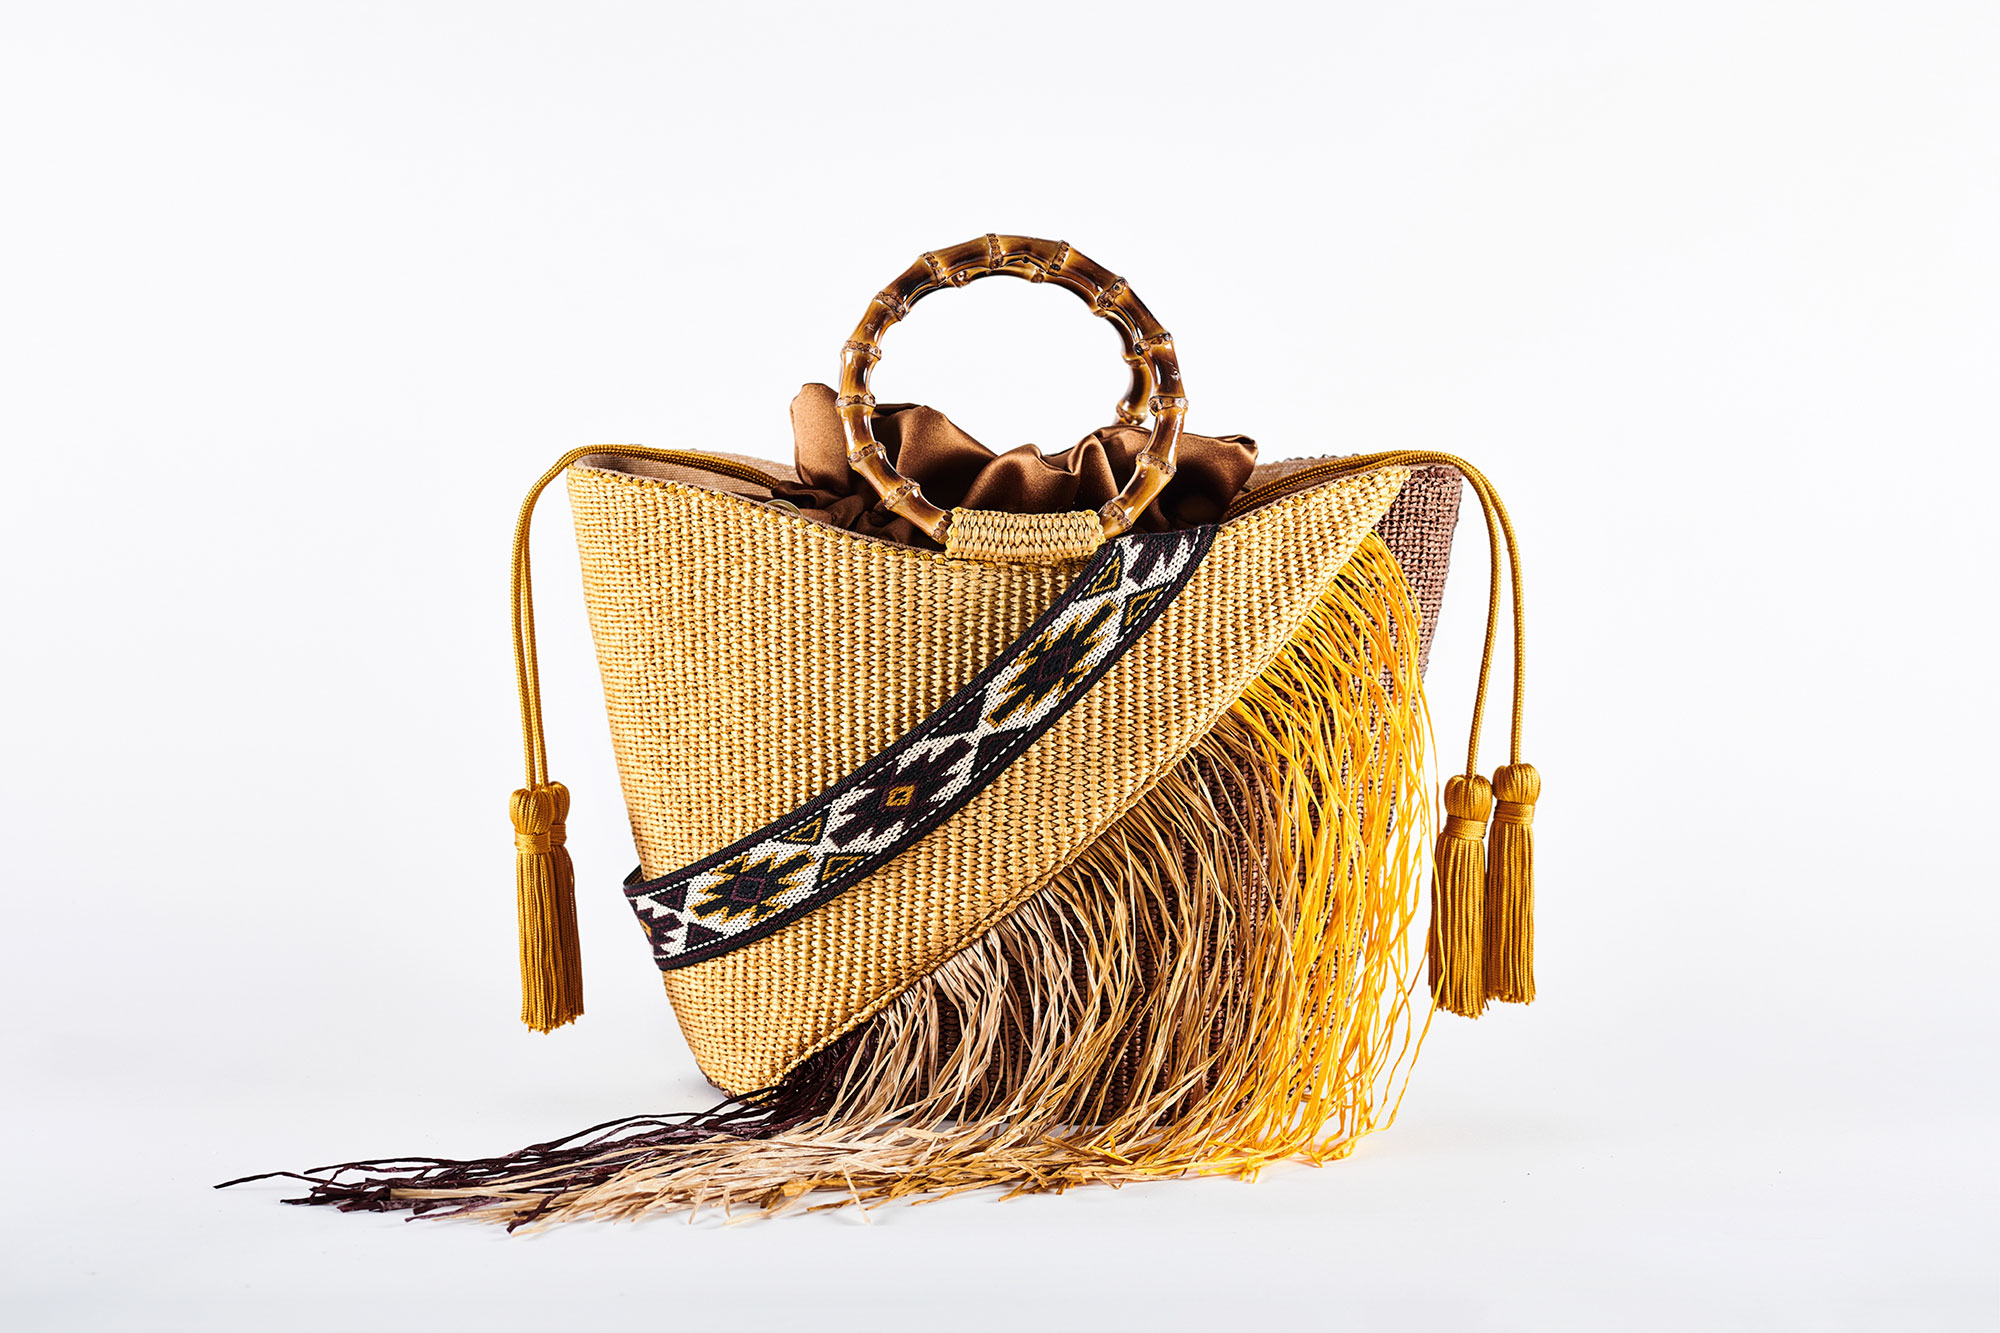 viamailbag-tahiti-fringe-a02